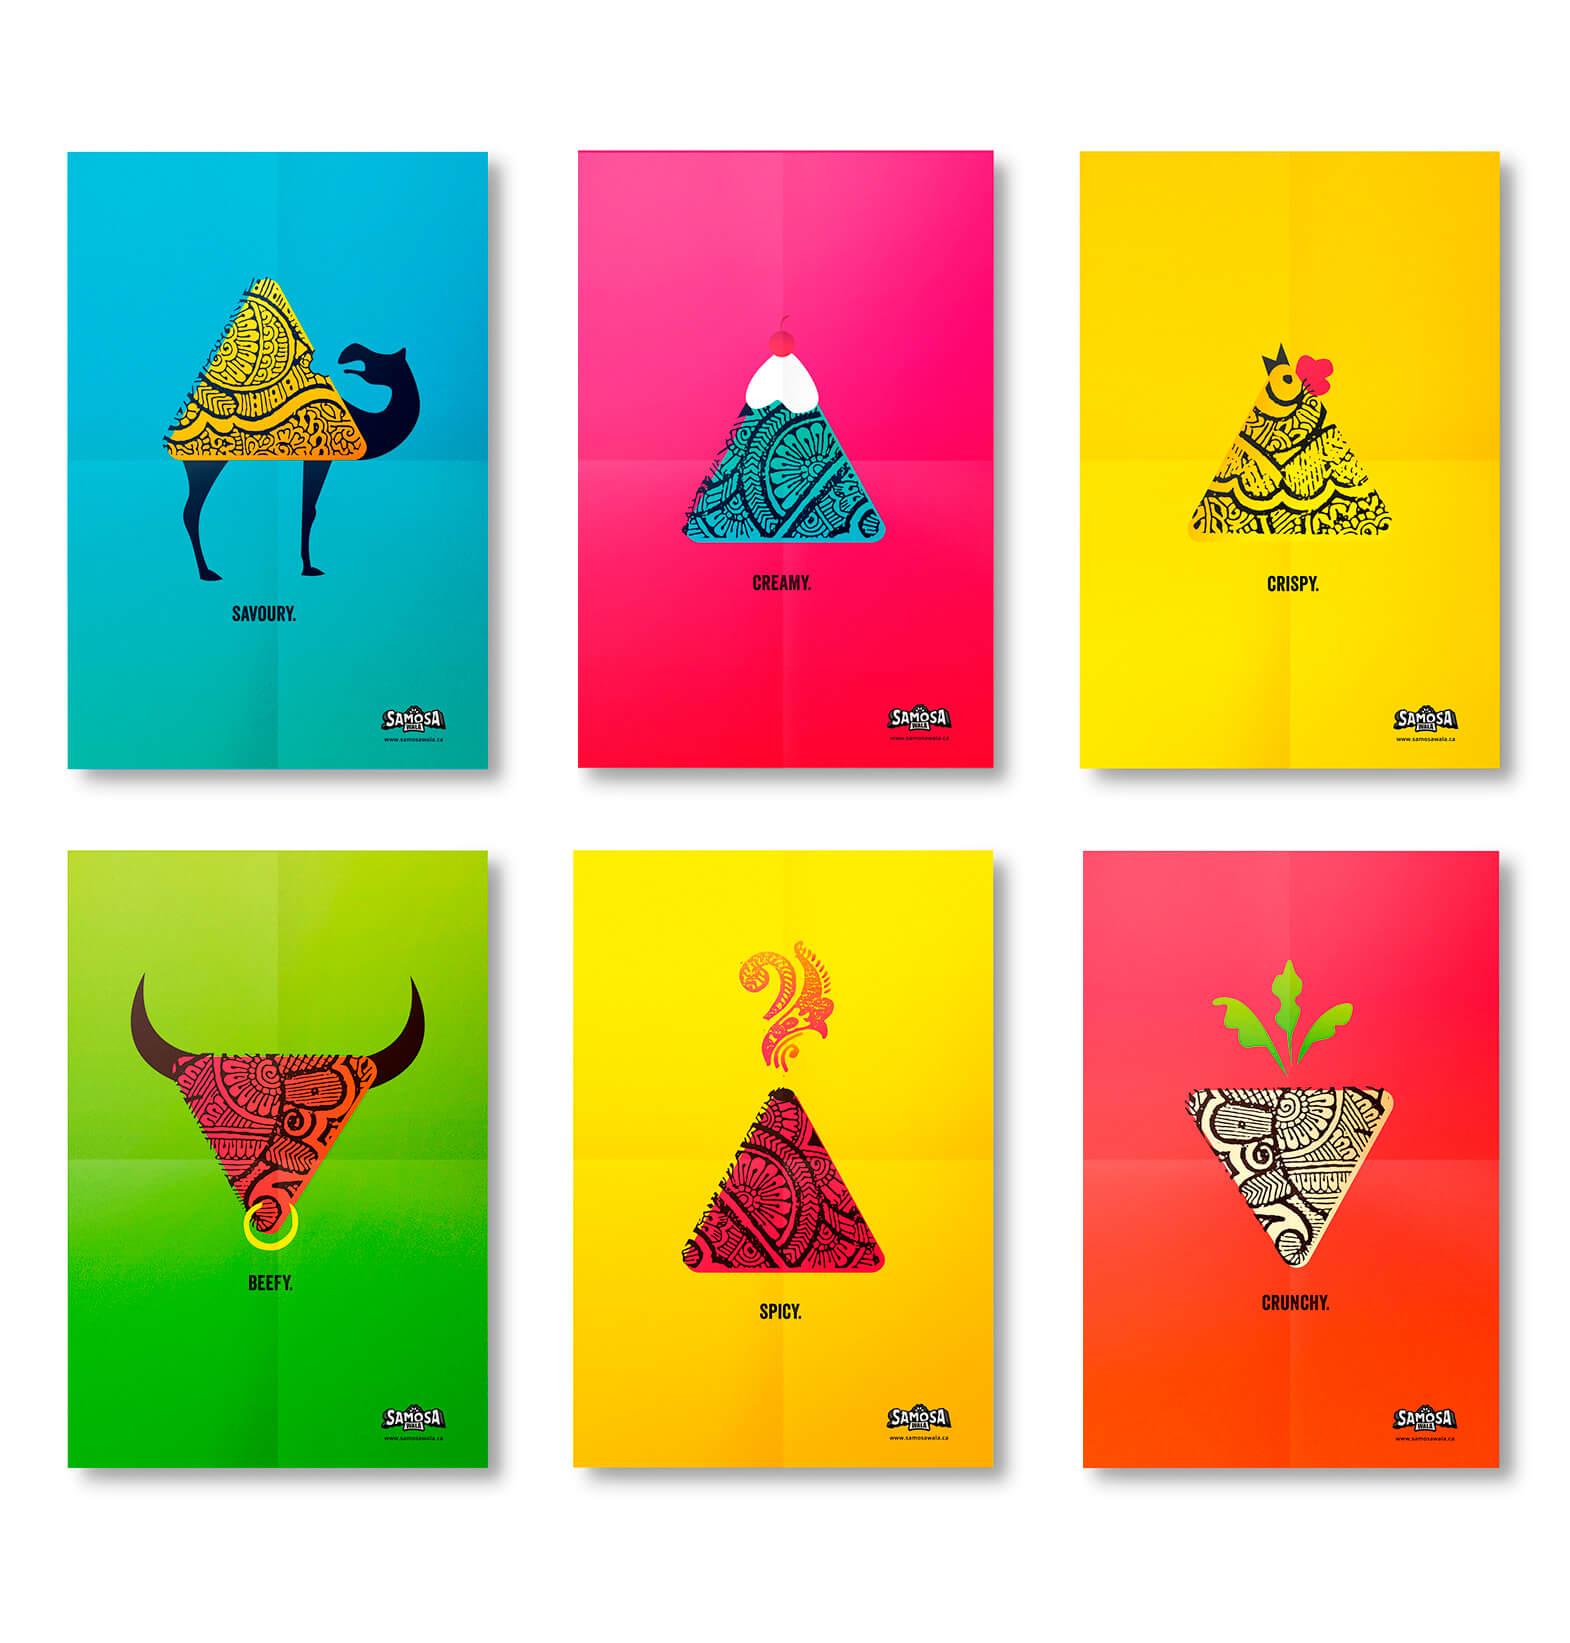 SamosaWala_full-poster-set-samosa